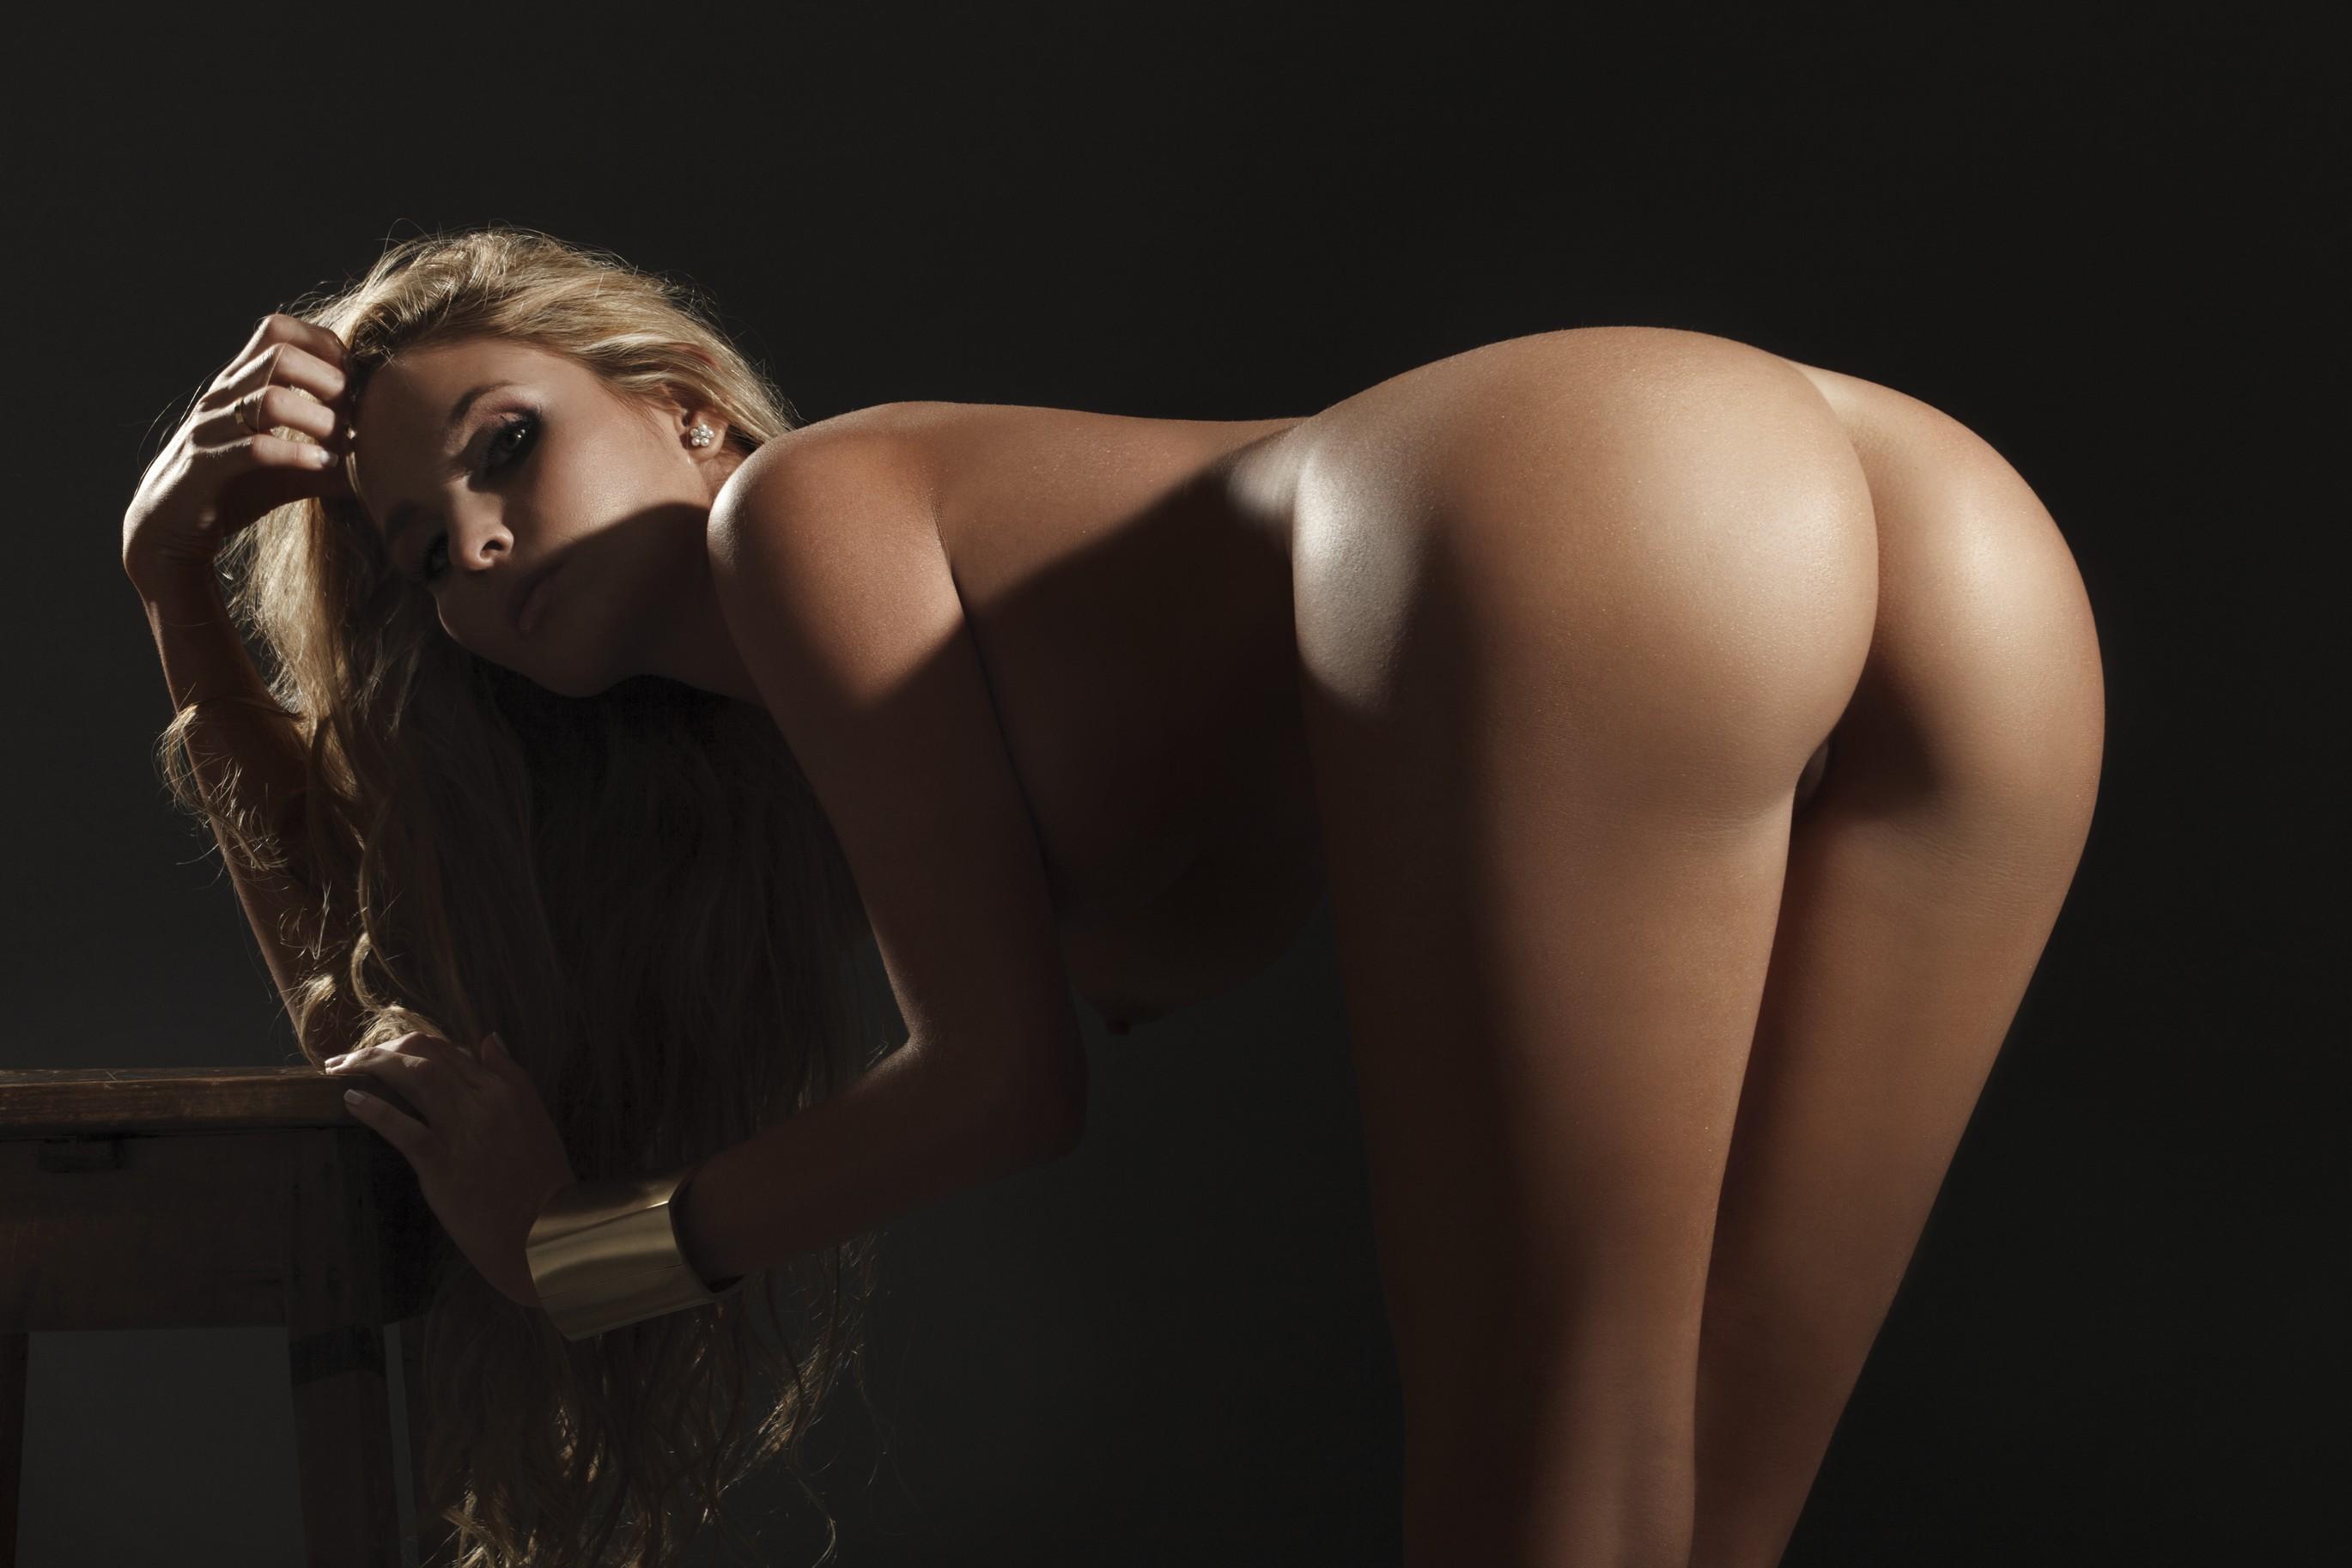 Playboy hairy butt